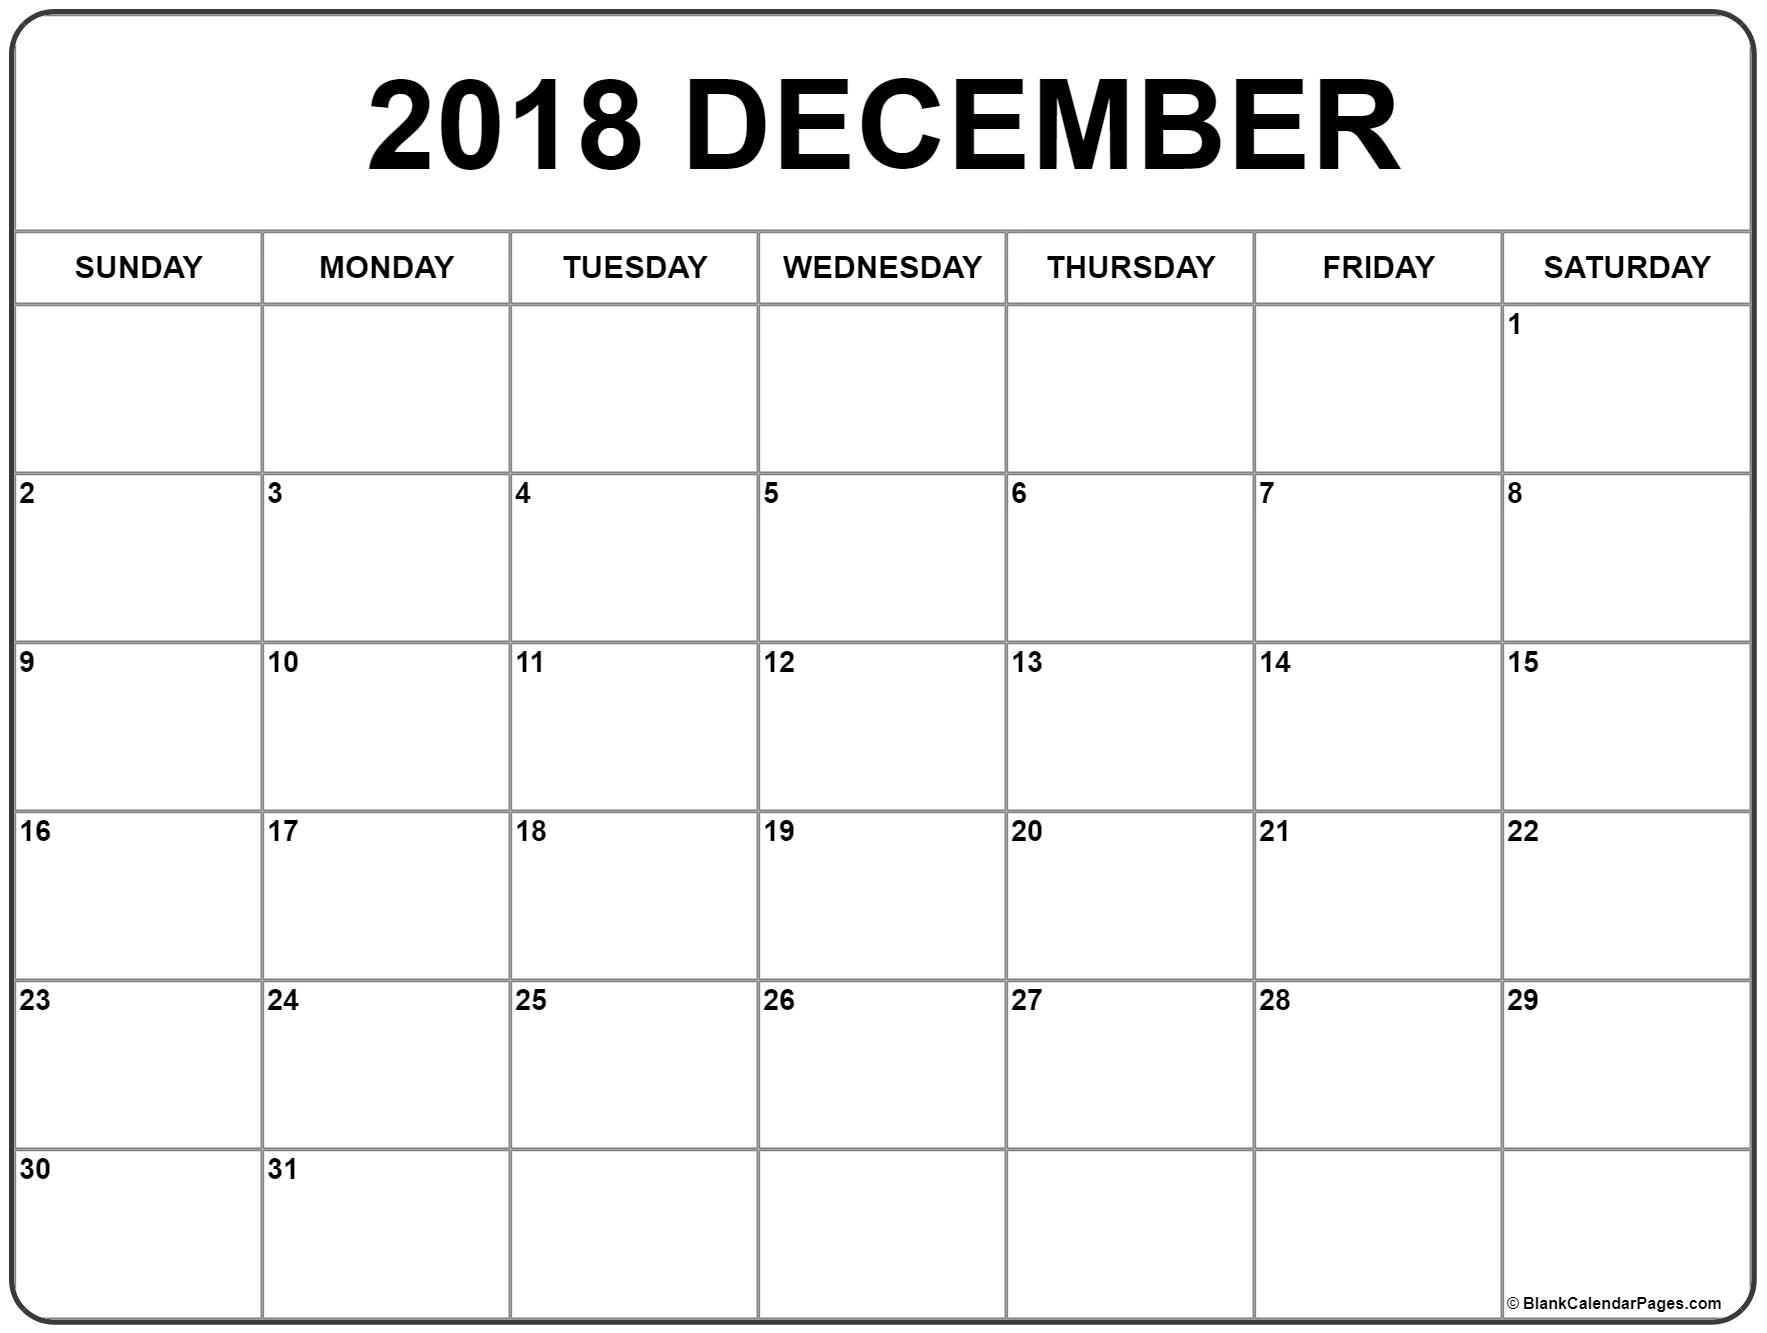 December 2018 Calendar December 2018 Calendar Printabledecember